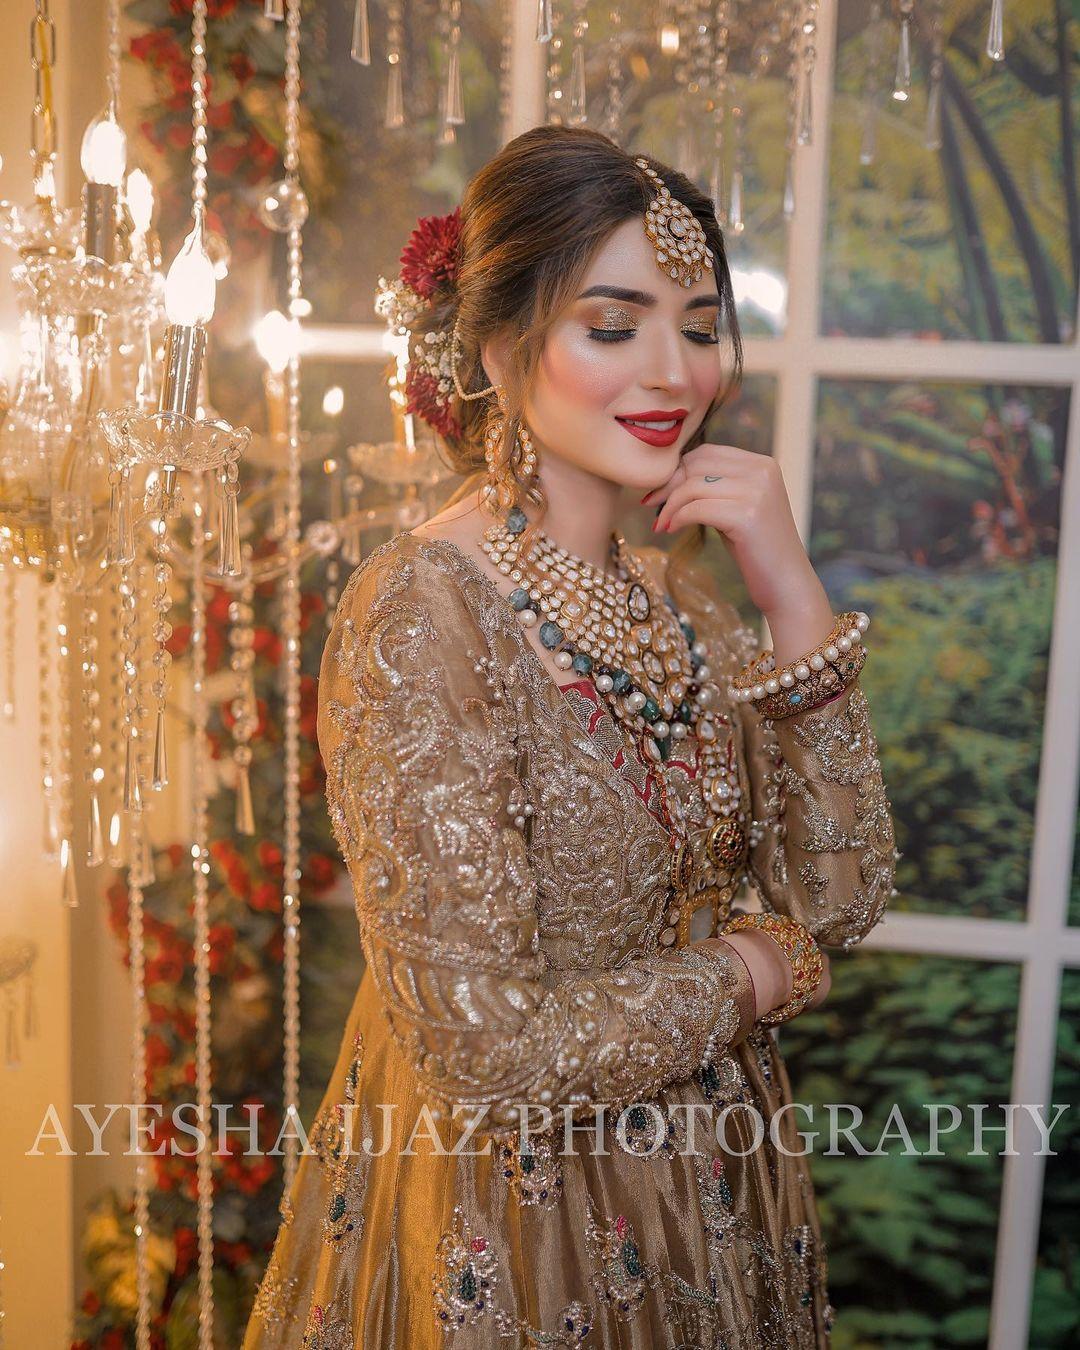 Ramsha Khan Leaves Fans Stunned in Her Latest Bridal Photoshoot!